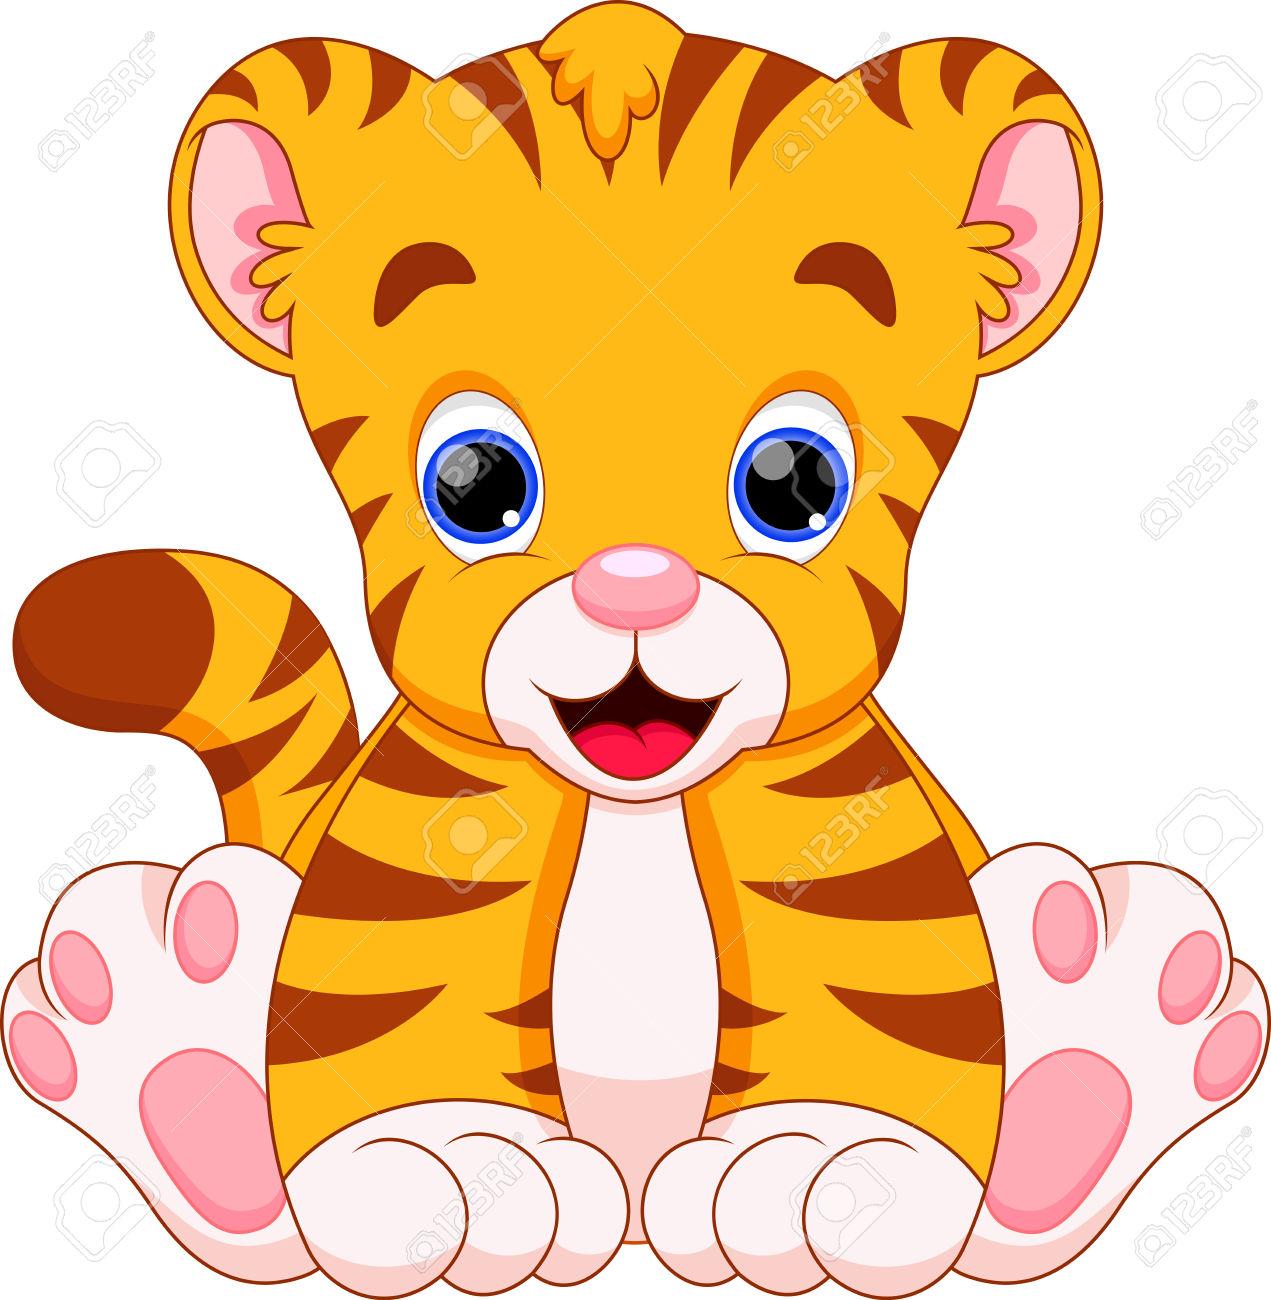 Tiger clipart baby boy #14